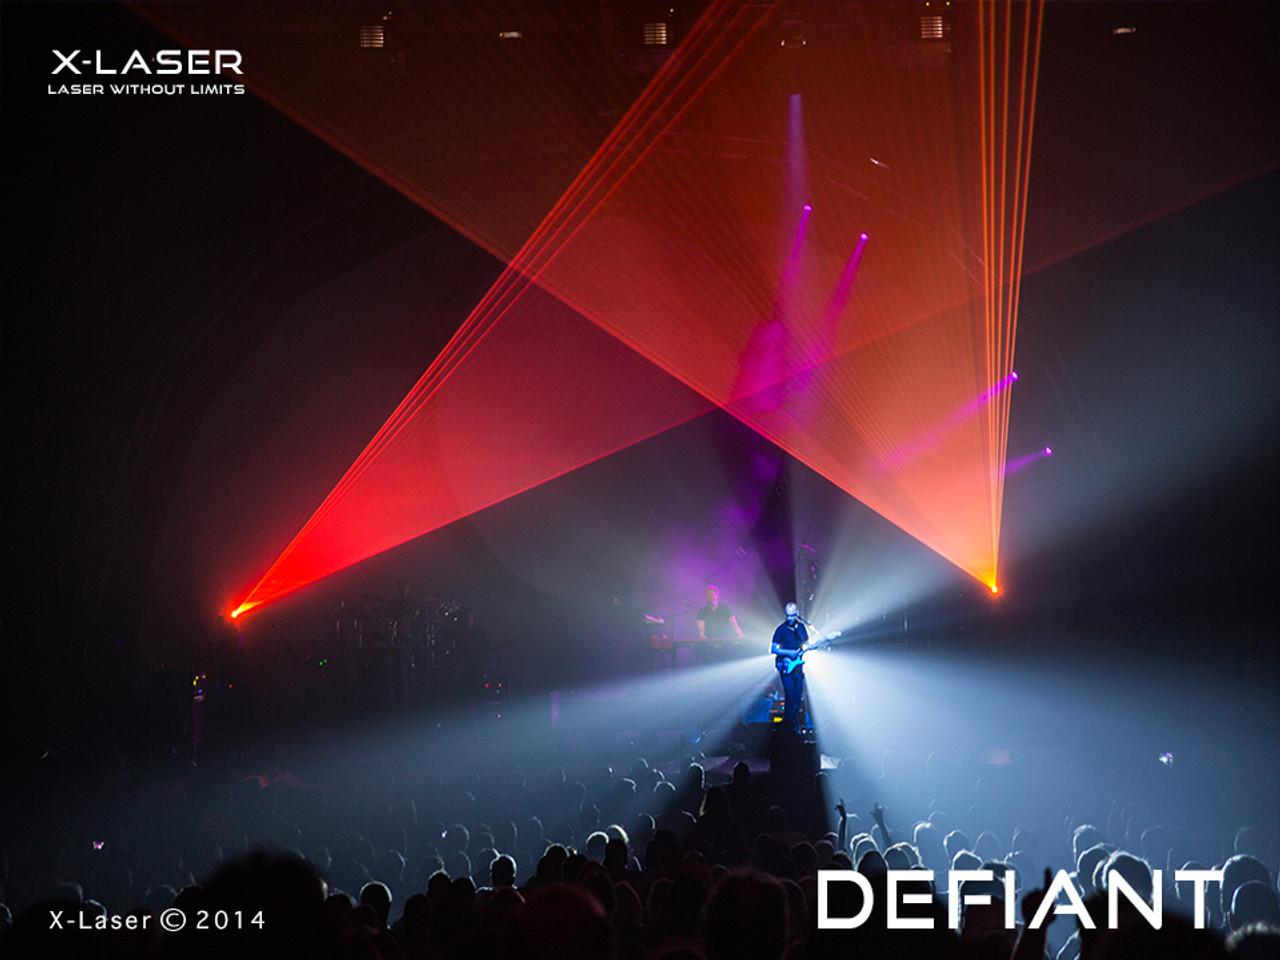 X-Laser Defiant RGB Laser / Polaris Audience Immersion Technology